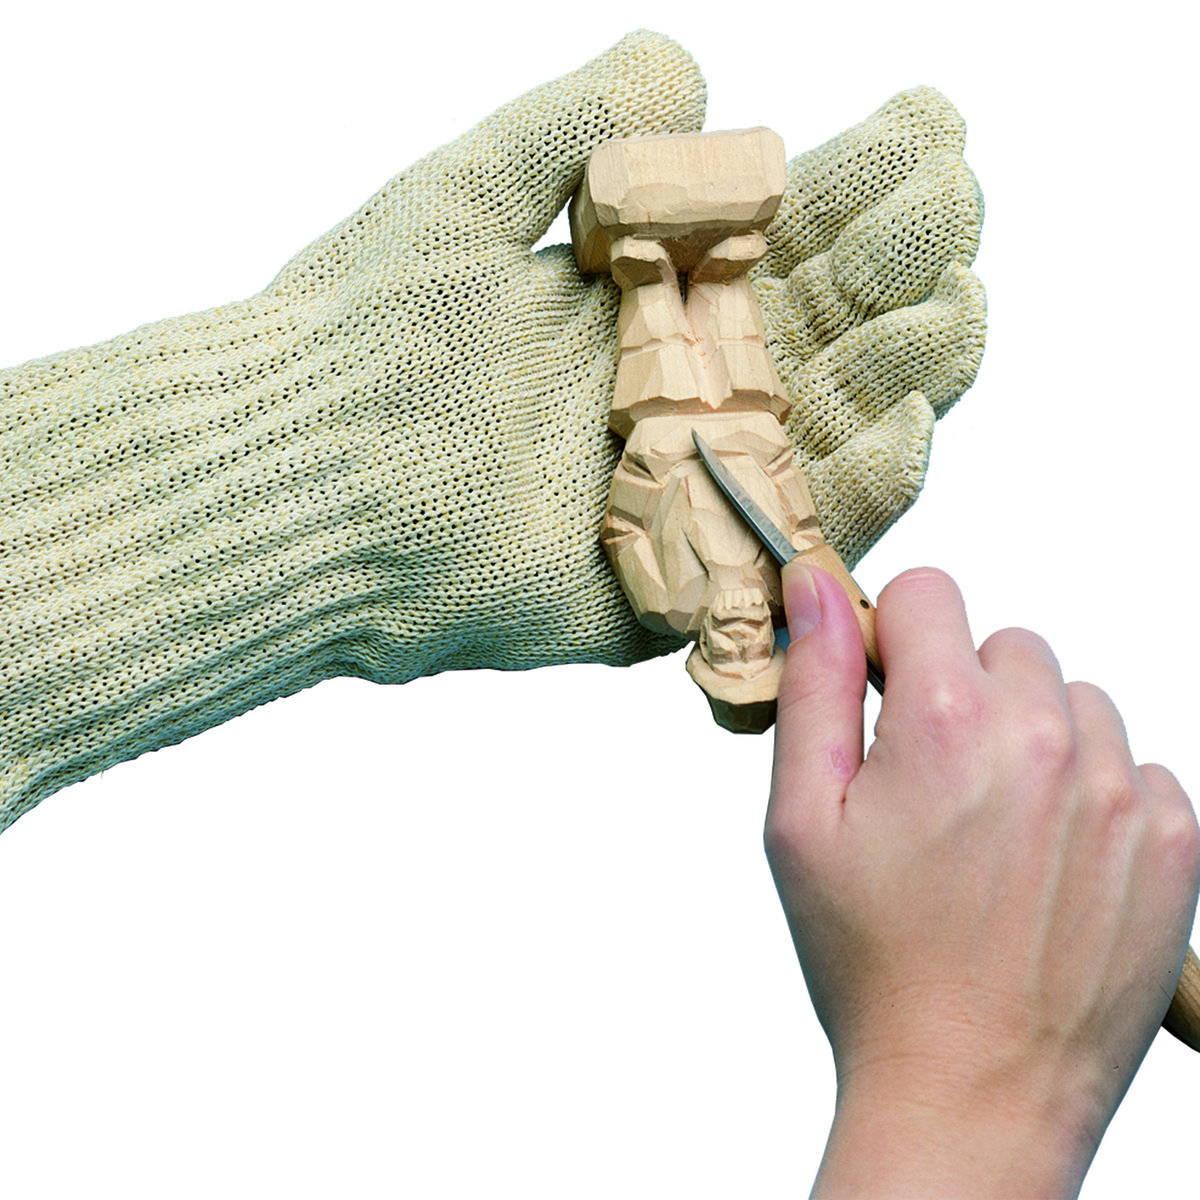 handheld engraver gloves